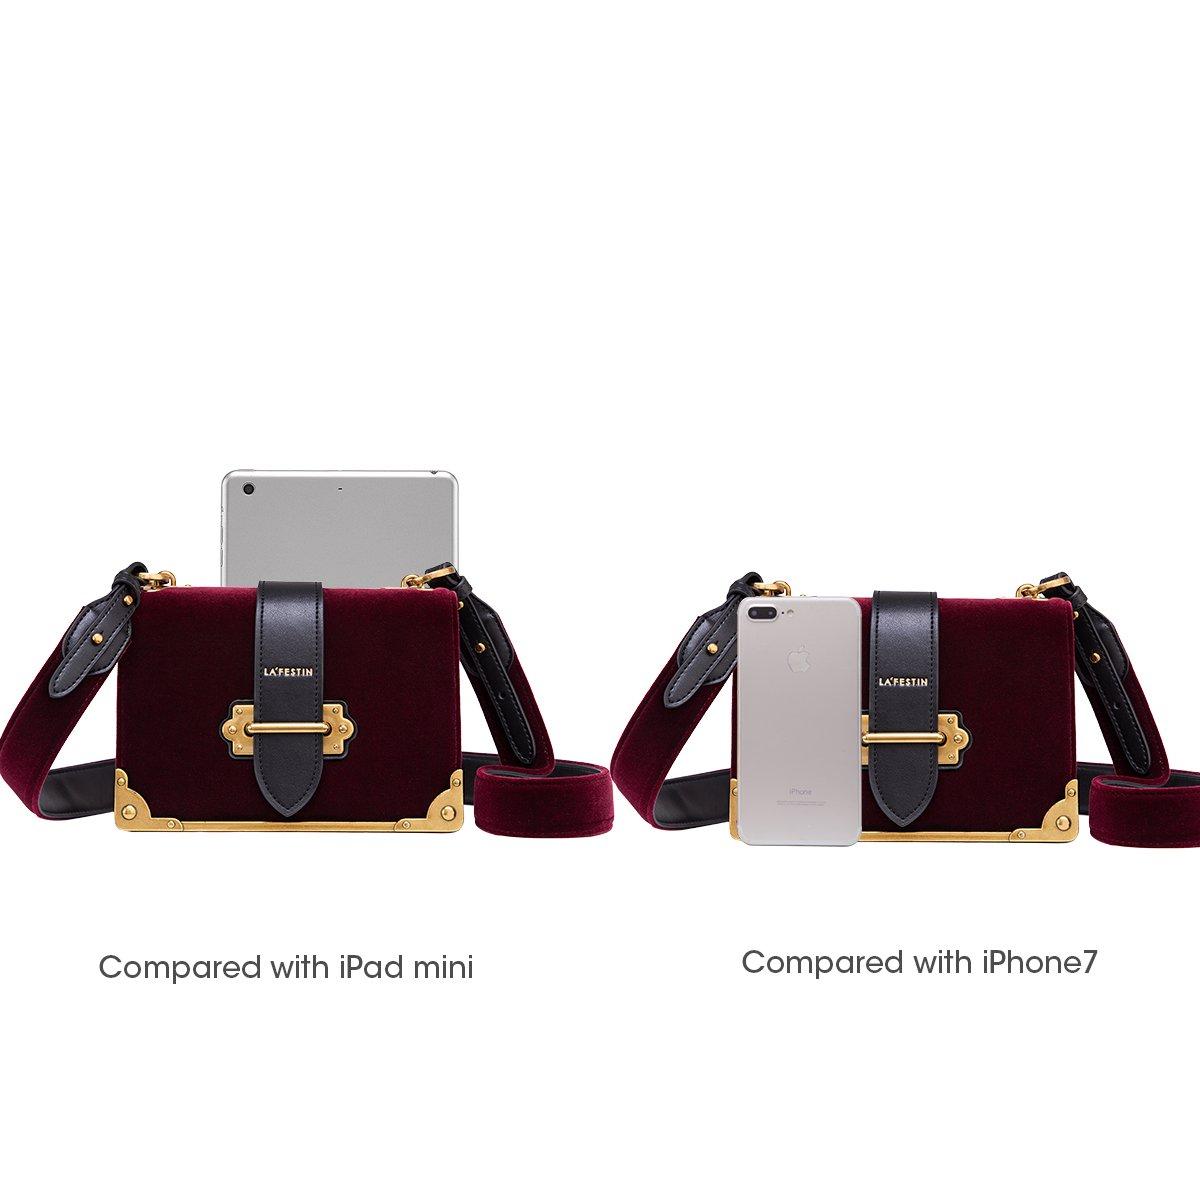 f73fafa9a353e9 LA'FESTIN Velvet Leather Shoulder Bag for Ladies Cross Body Handbag Black:  Amazon.ca: Shoes & Handbags